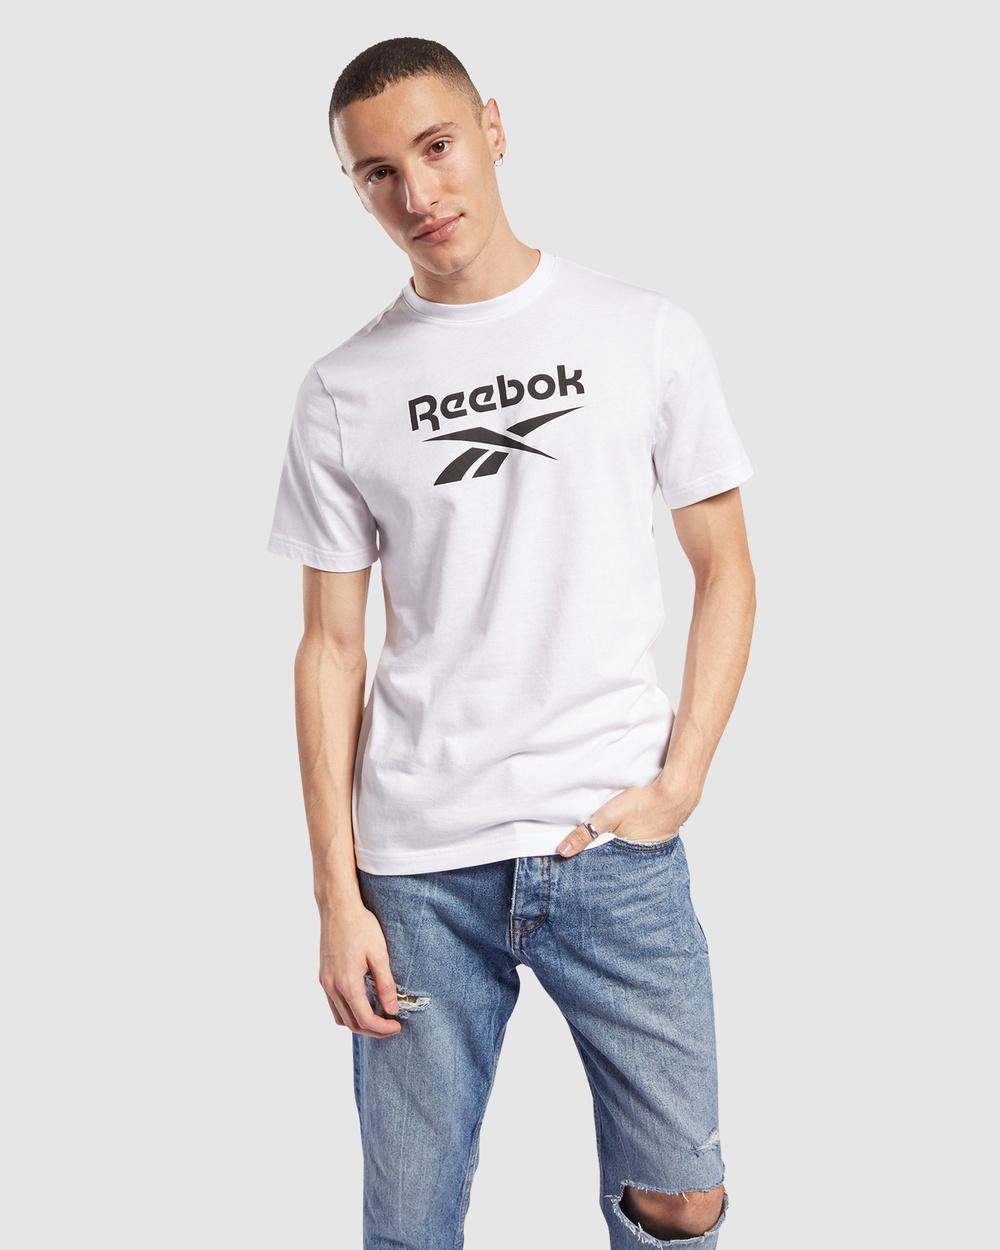 Reebok Classics - Classics Vector Tee - Long Sleeve T-Shirts (White) Classics Vector Tee